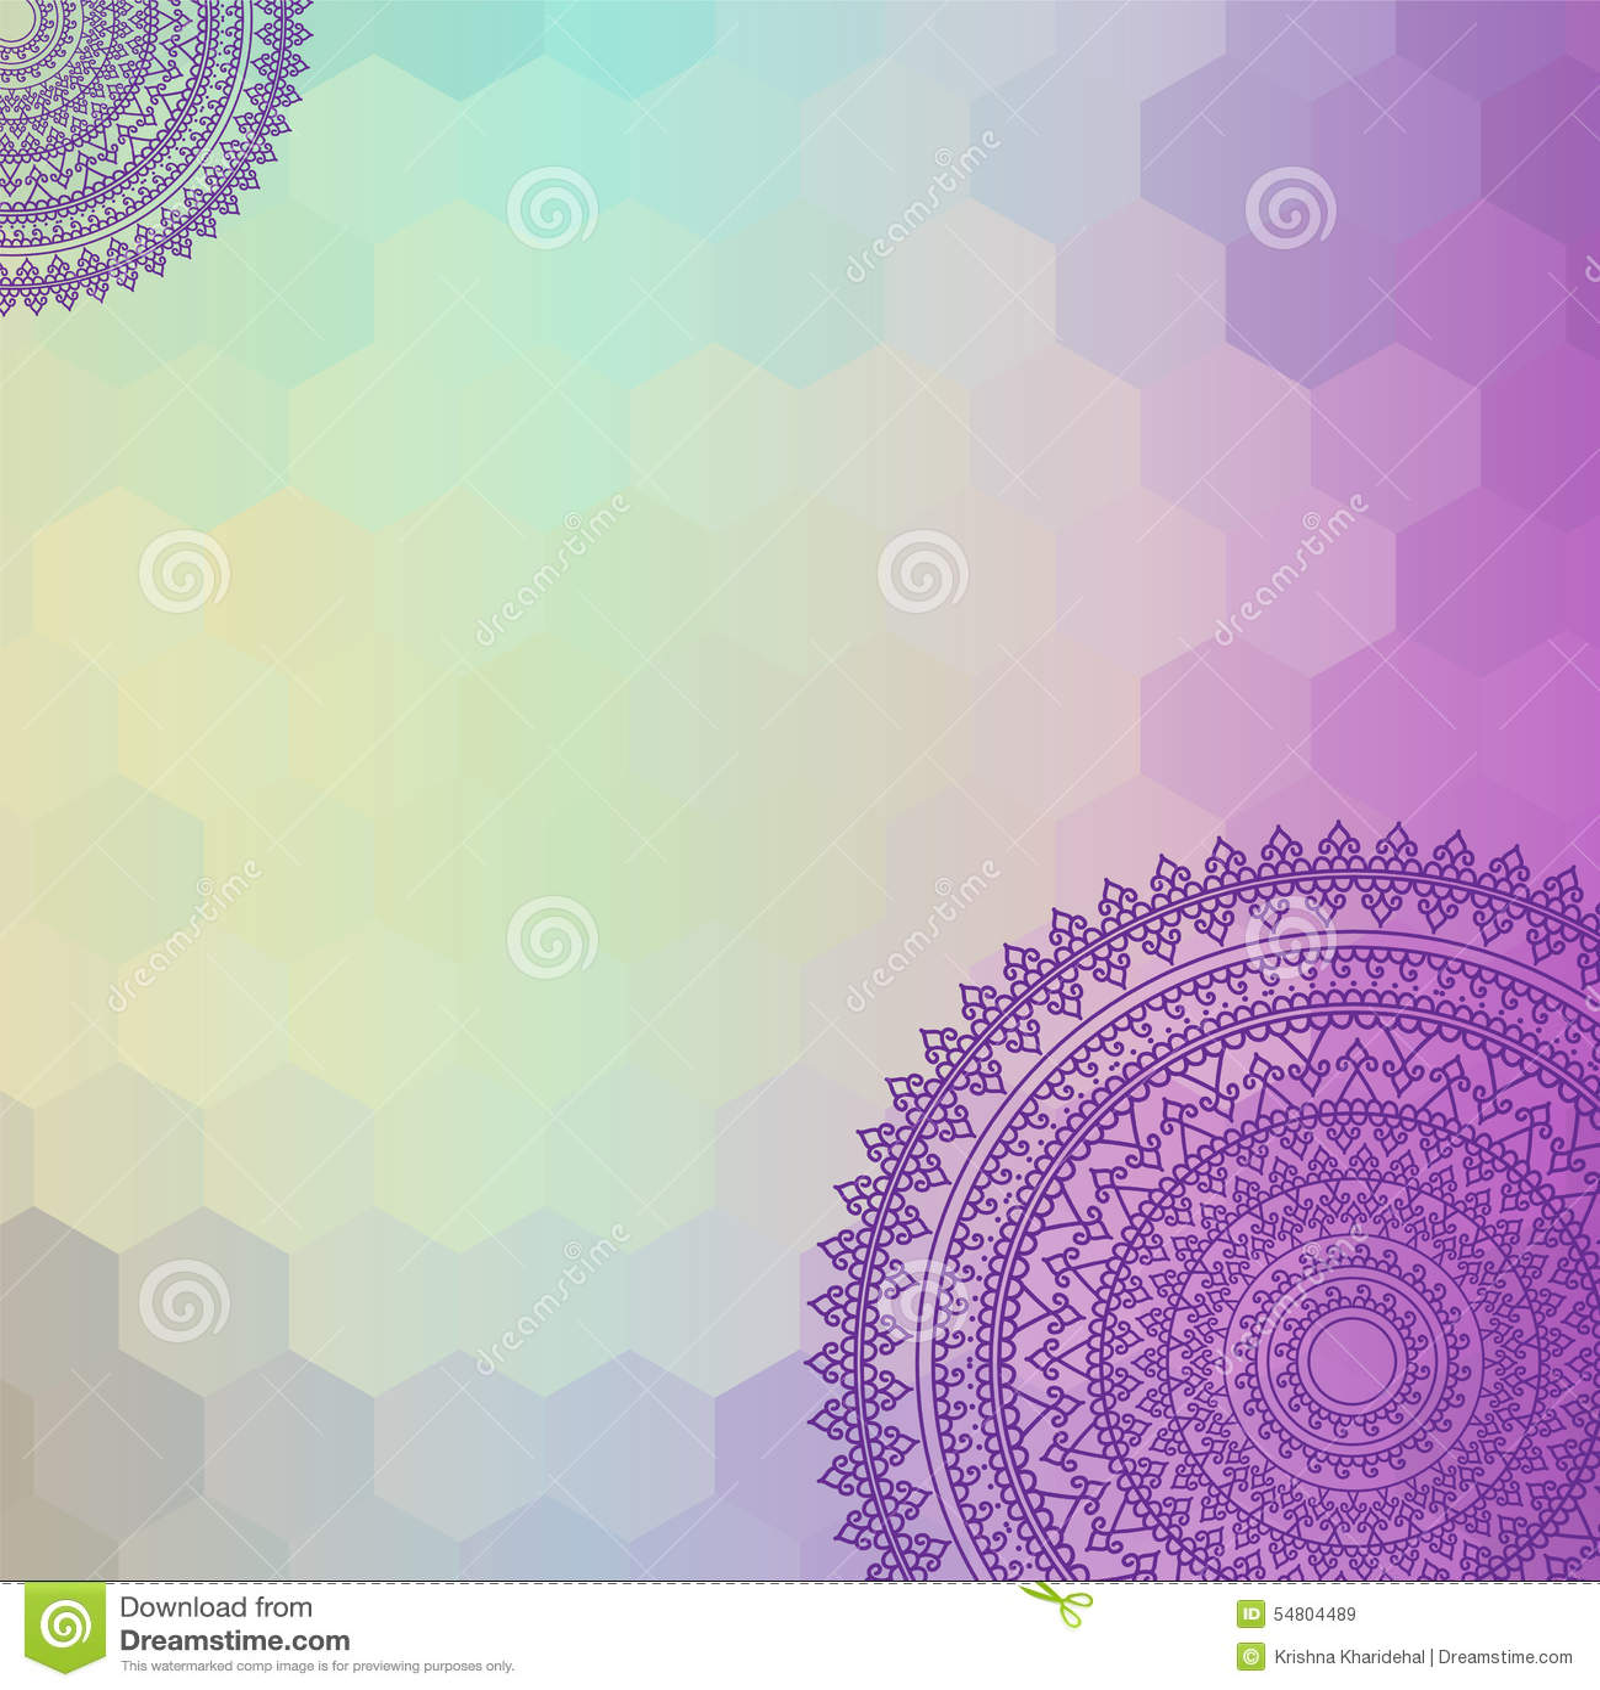 Colour Henna Mandala Background Stock Vector  Image 54804489